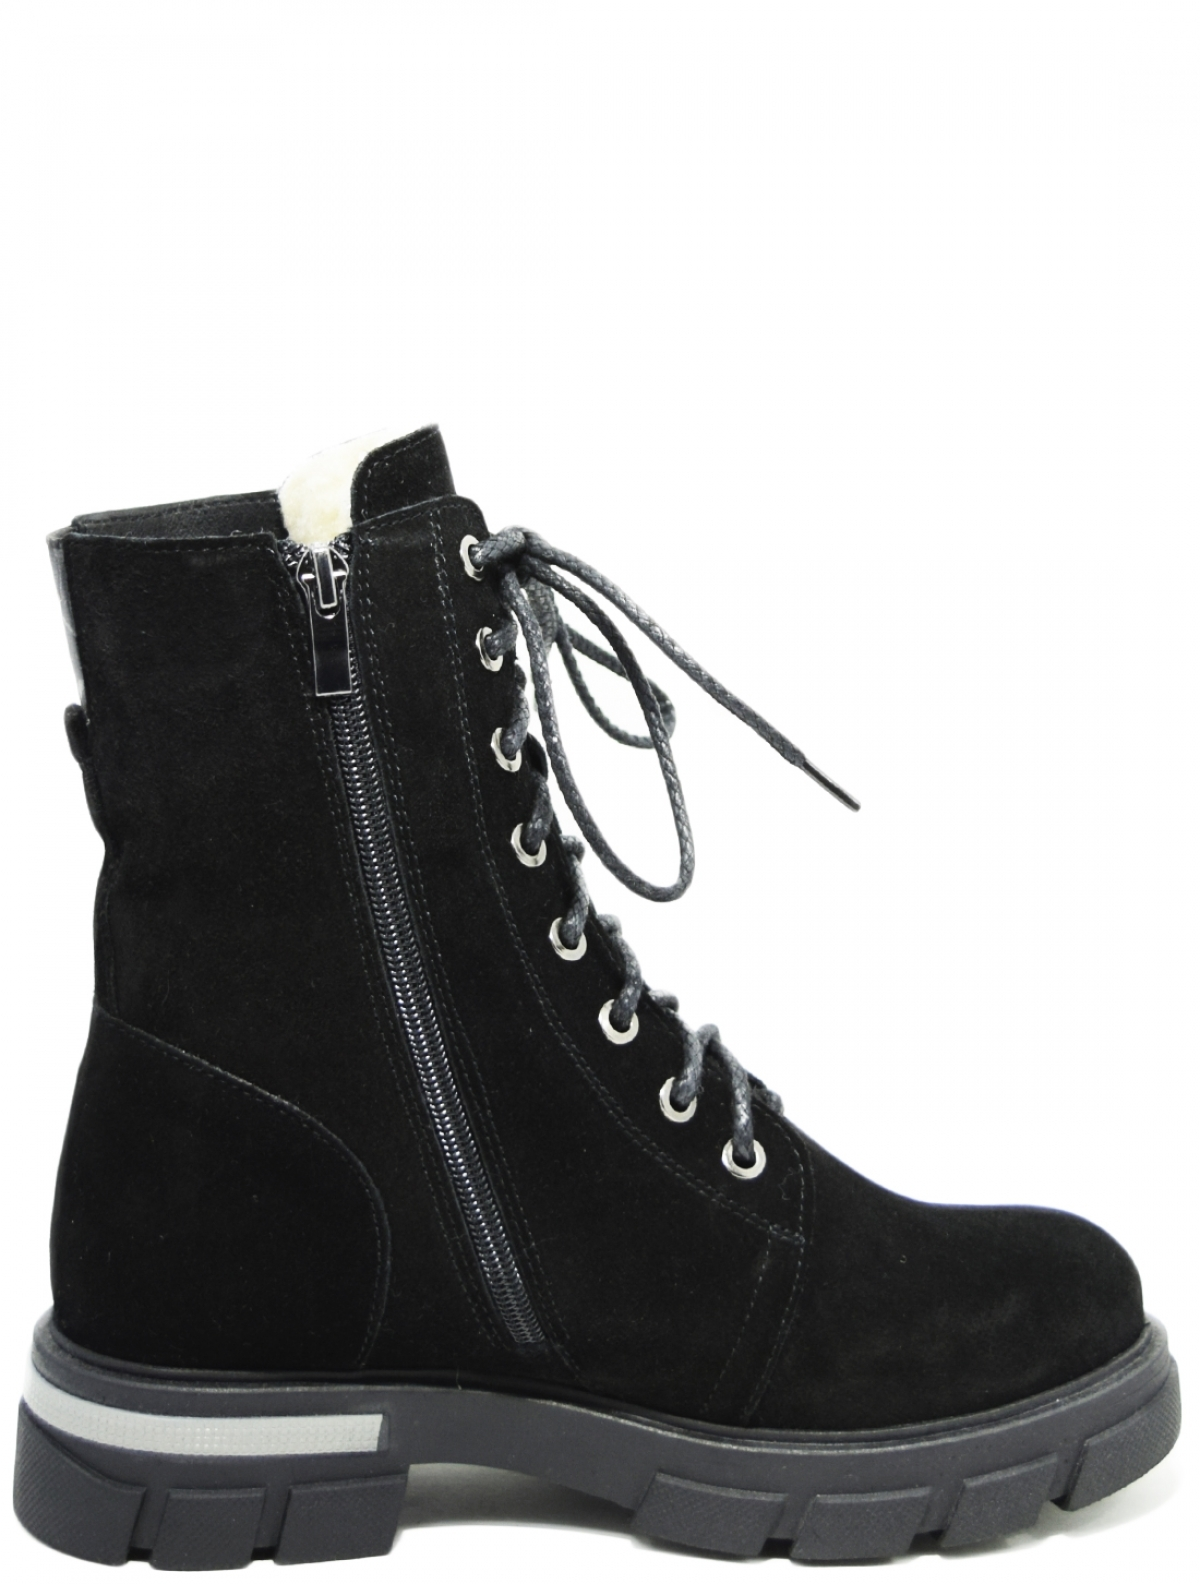 Selm 1916-4 женские ботинки